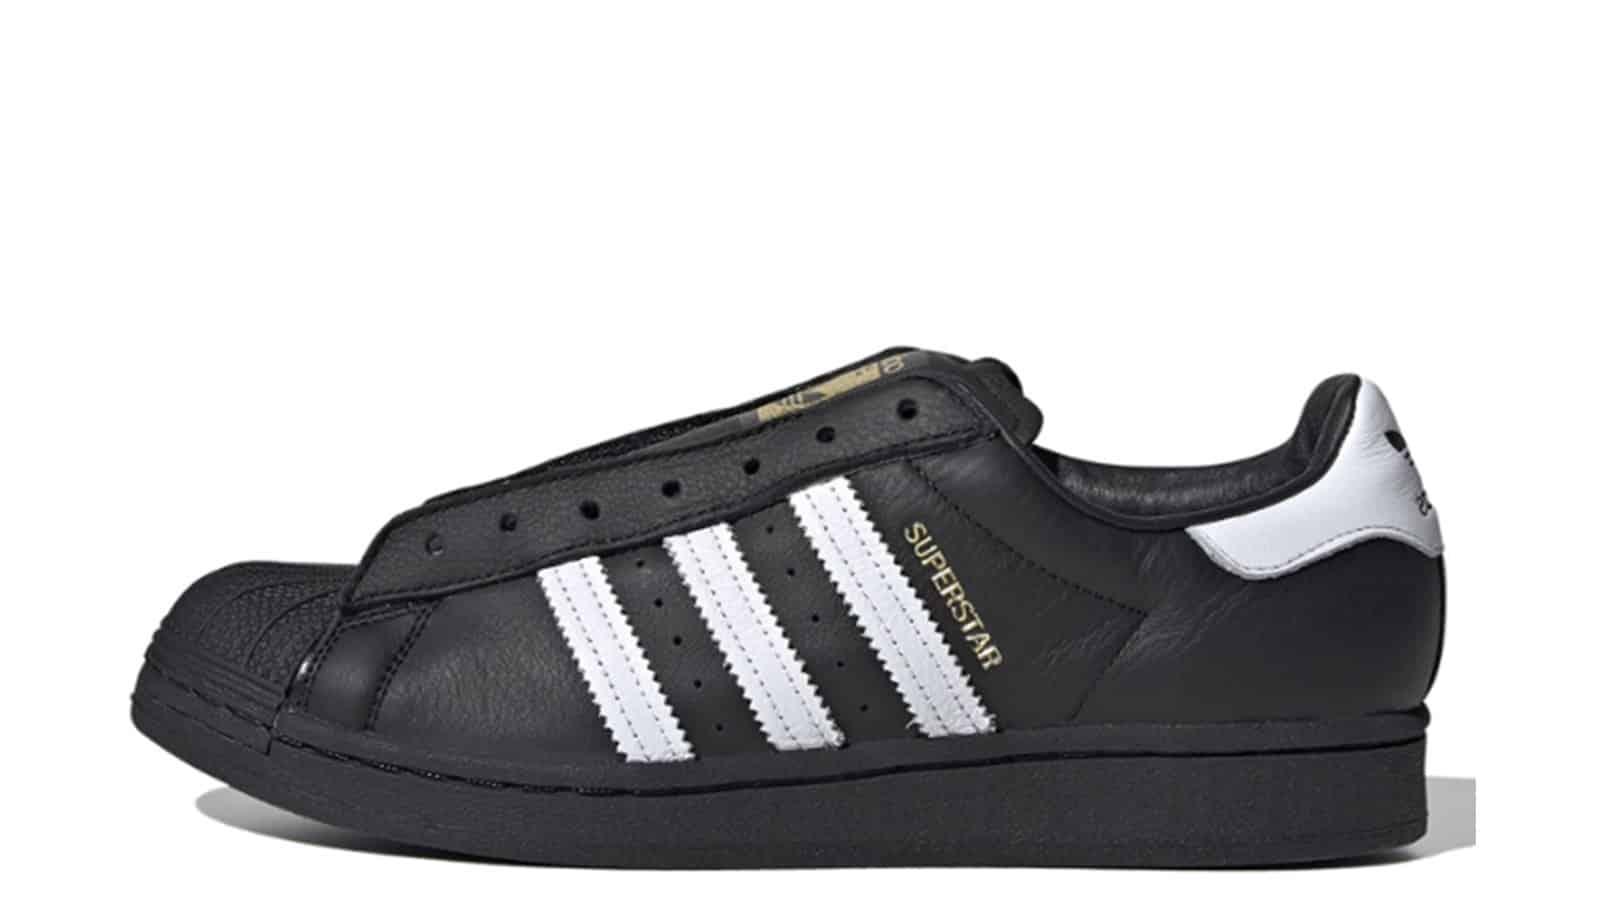 Adidas Superstar Laceless Black